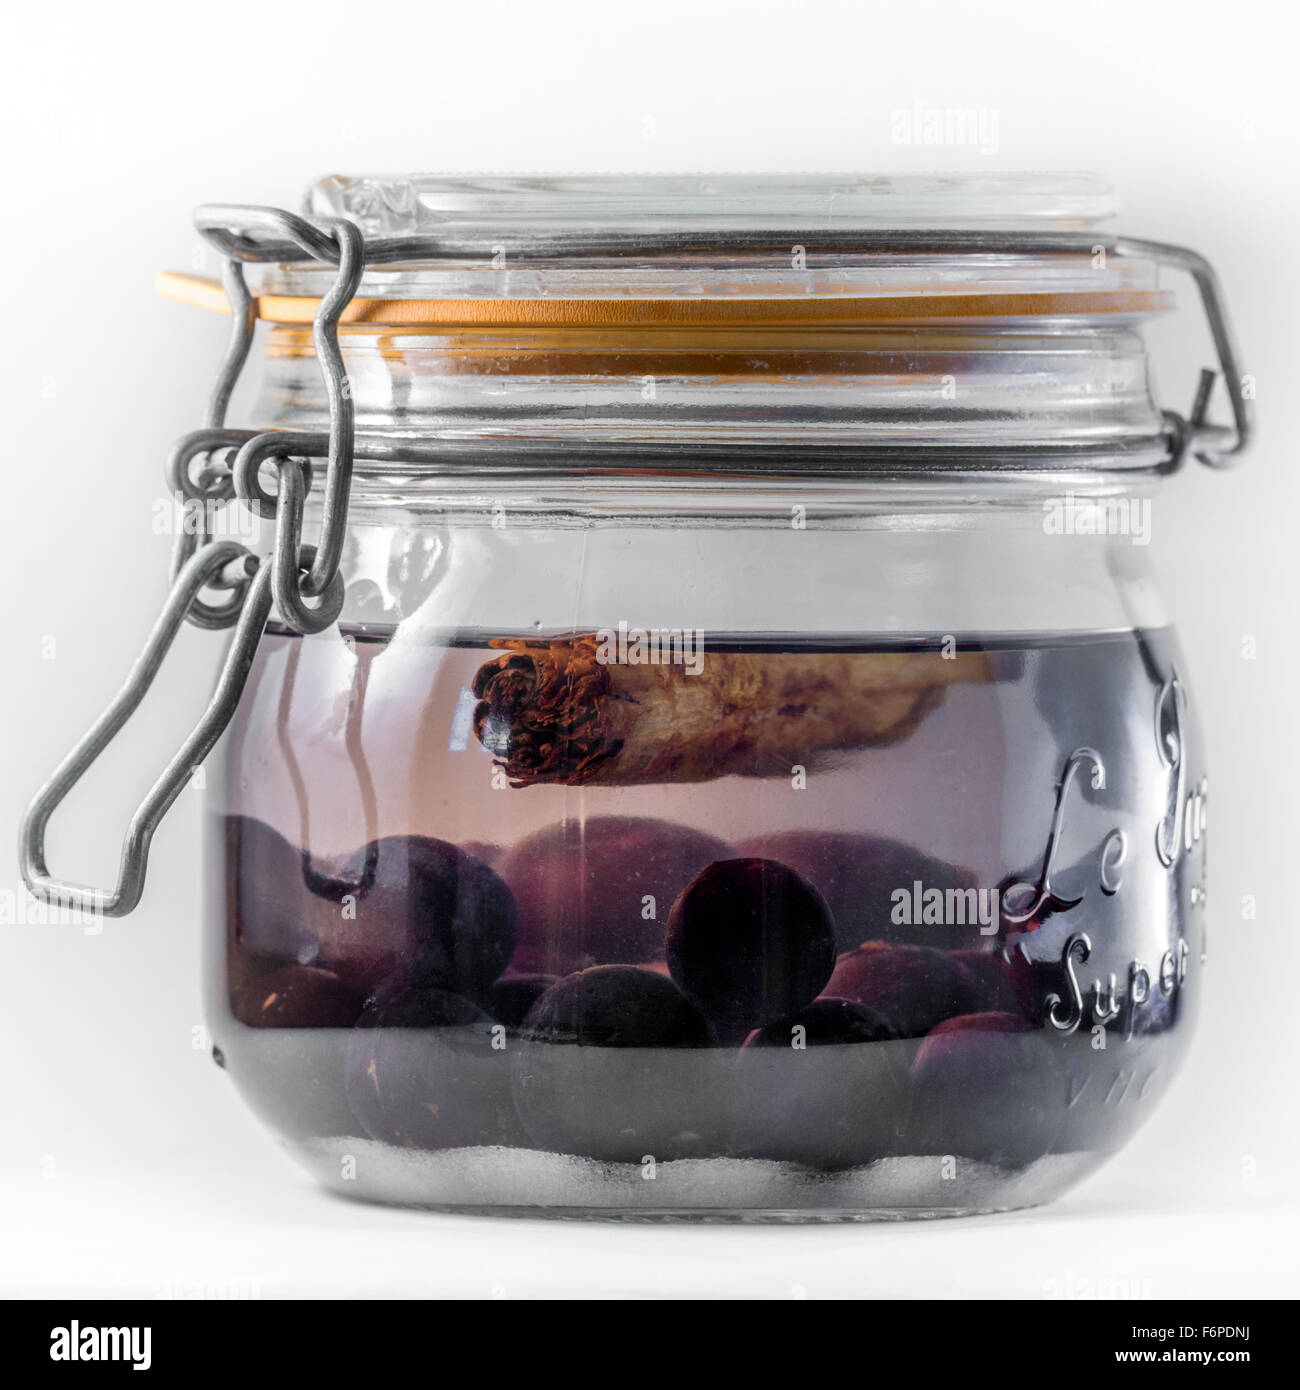 Day 1 Making Sloe Gin (kilner jar containing gin, sloe berries, sugar, cinnamon stick) - Stock Image